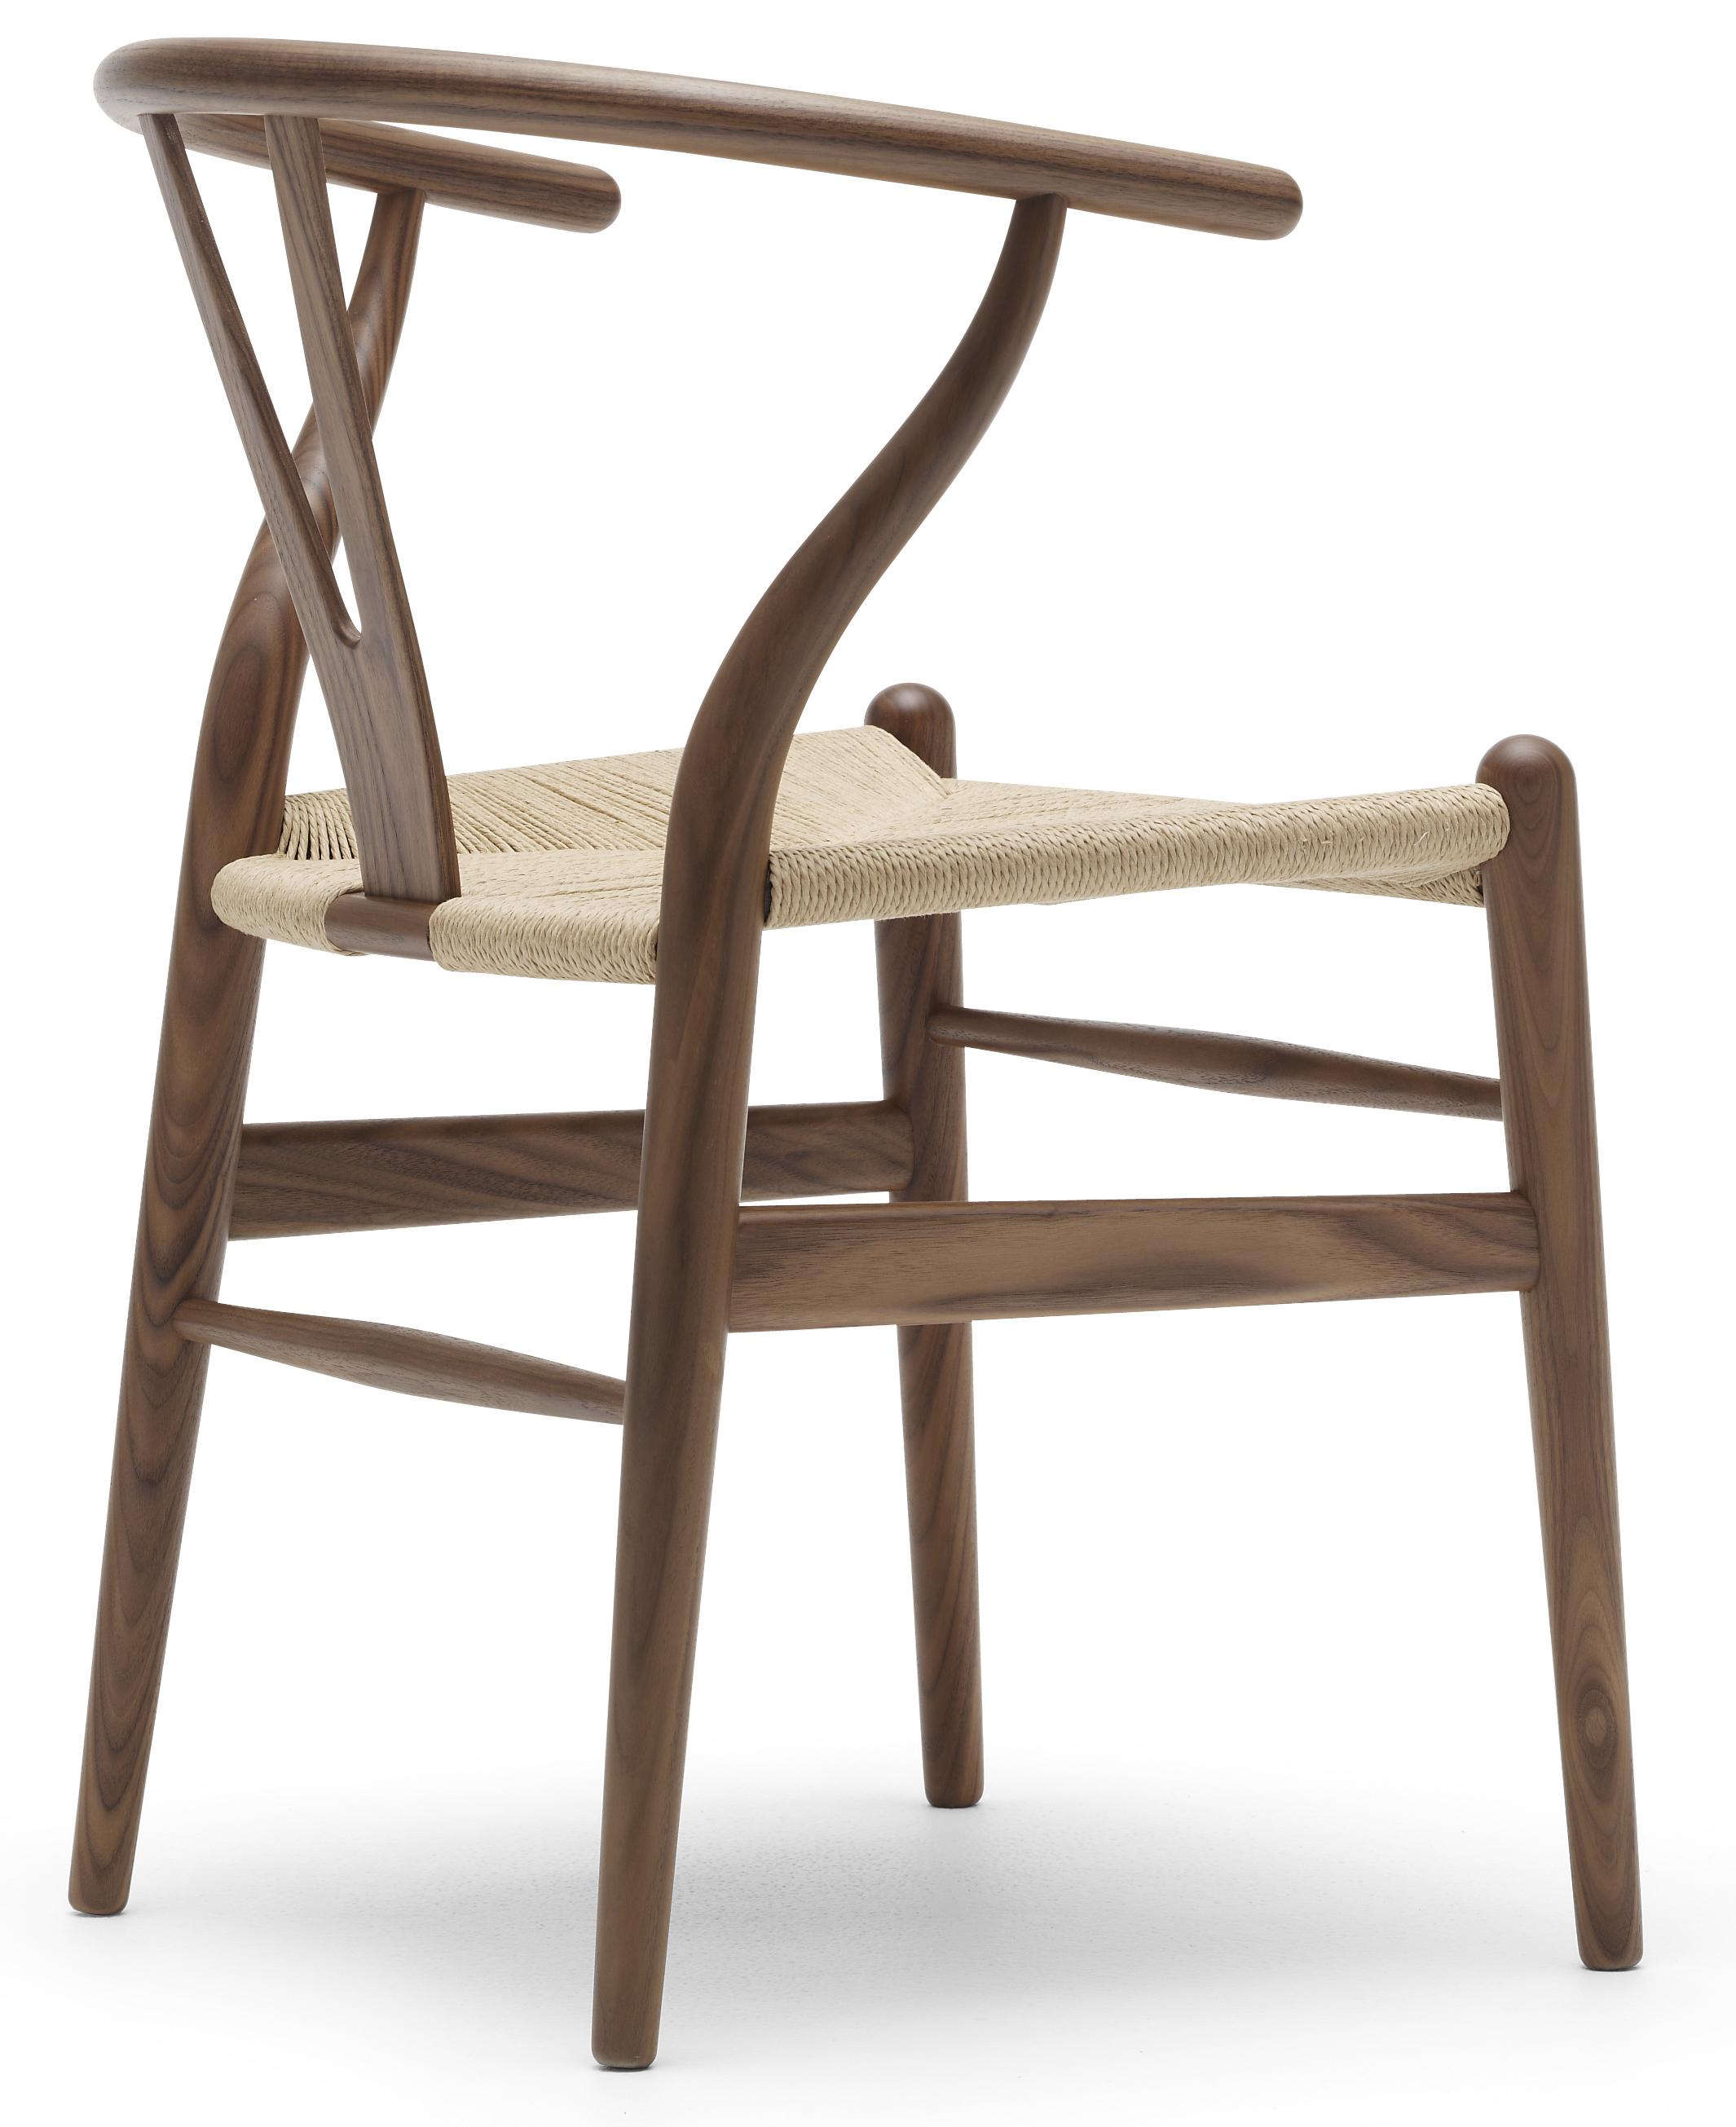 Carl Hansen & S¸n – Wishbone Chair CH24 Hans J Wegner